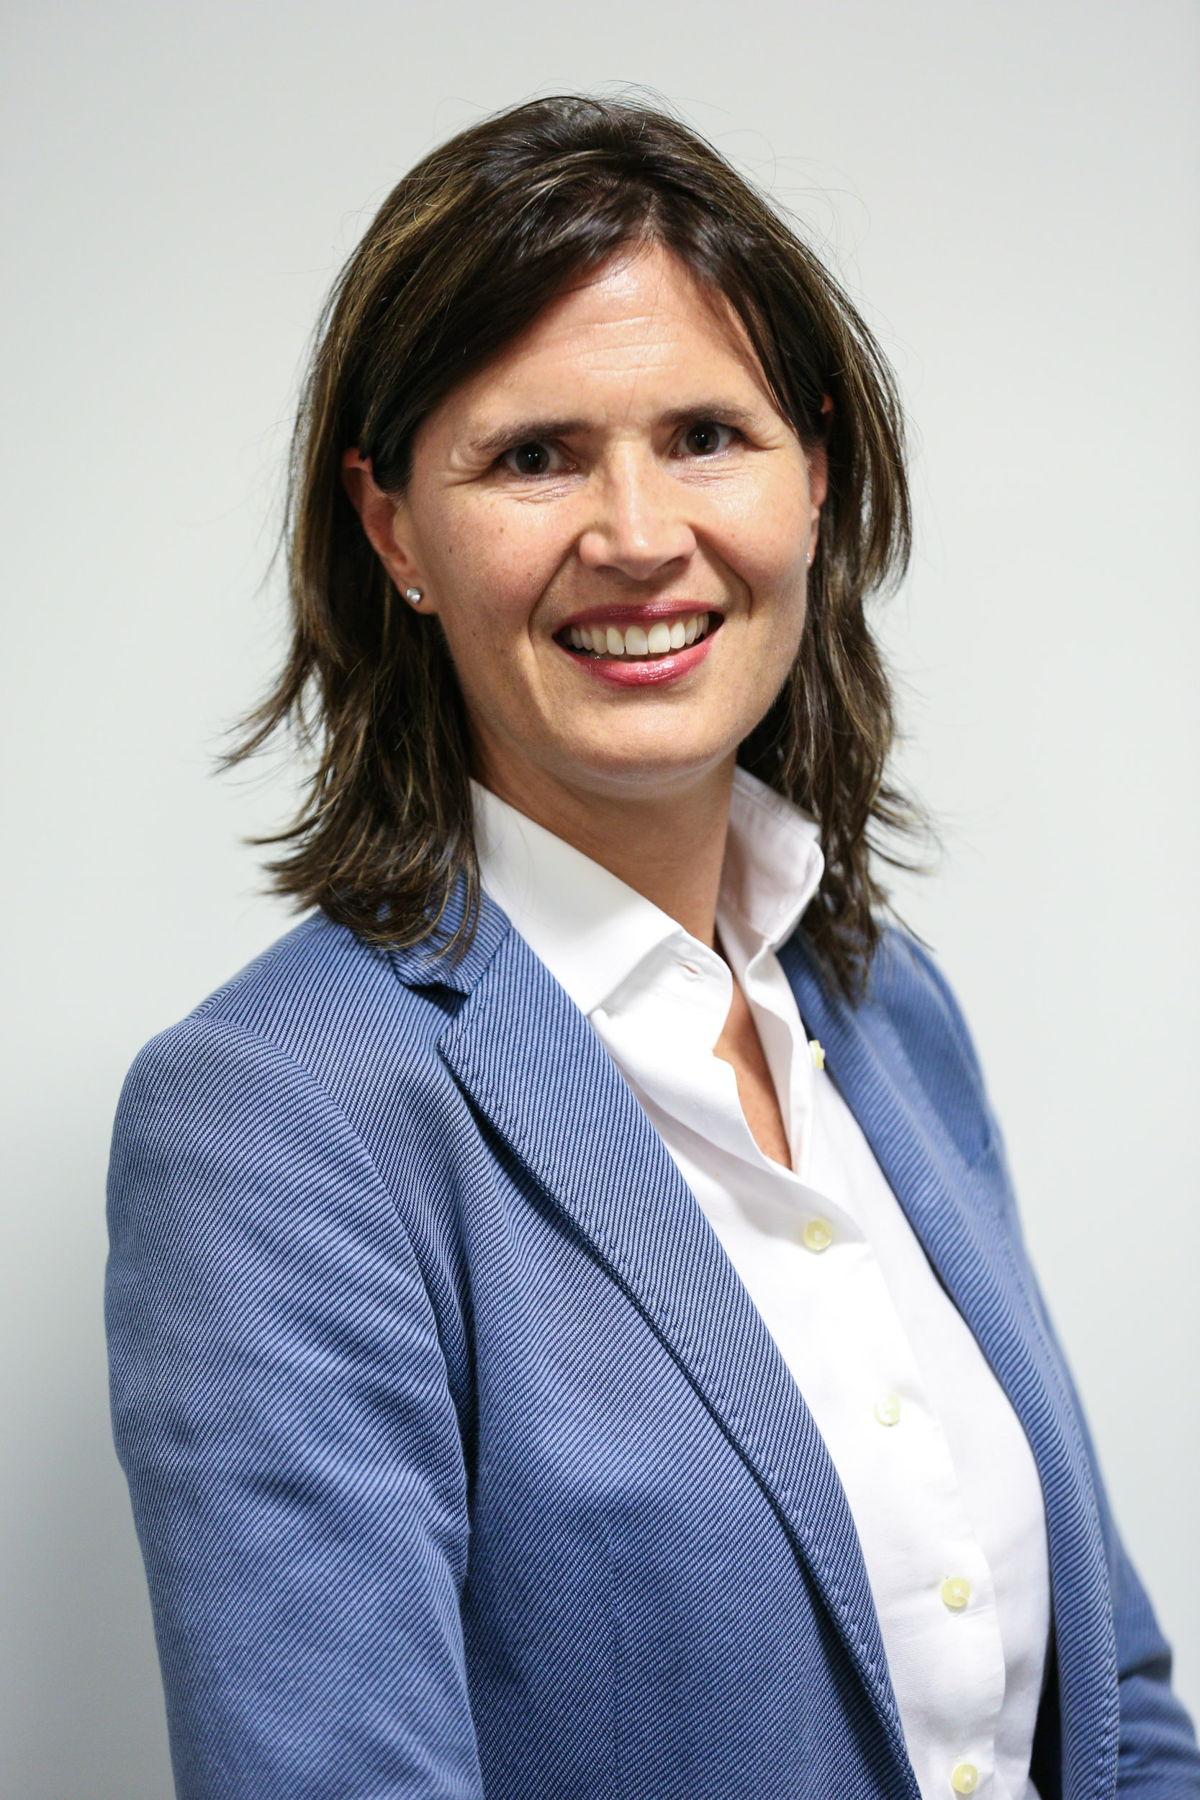 Josine Heijmans, Portfolio Director at dmg events